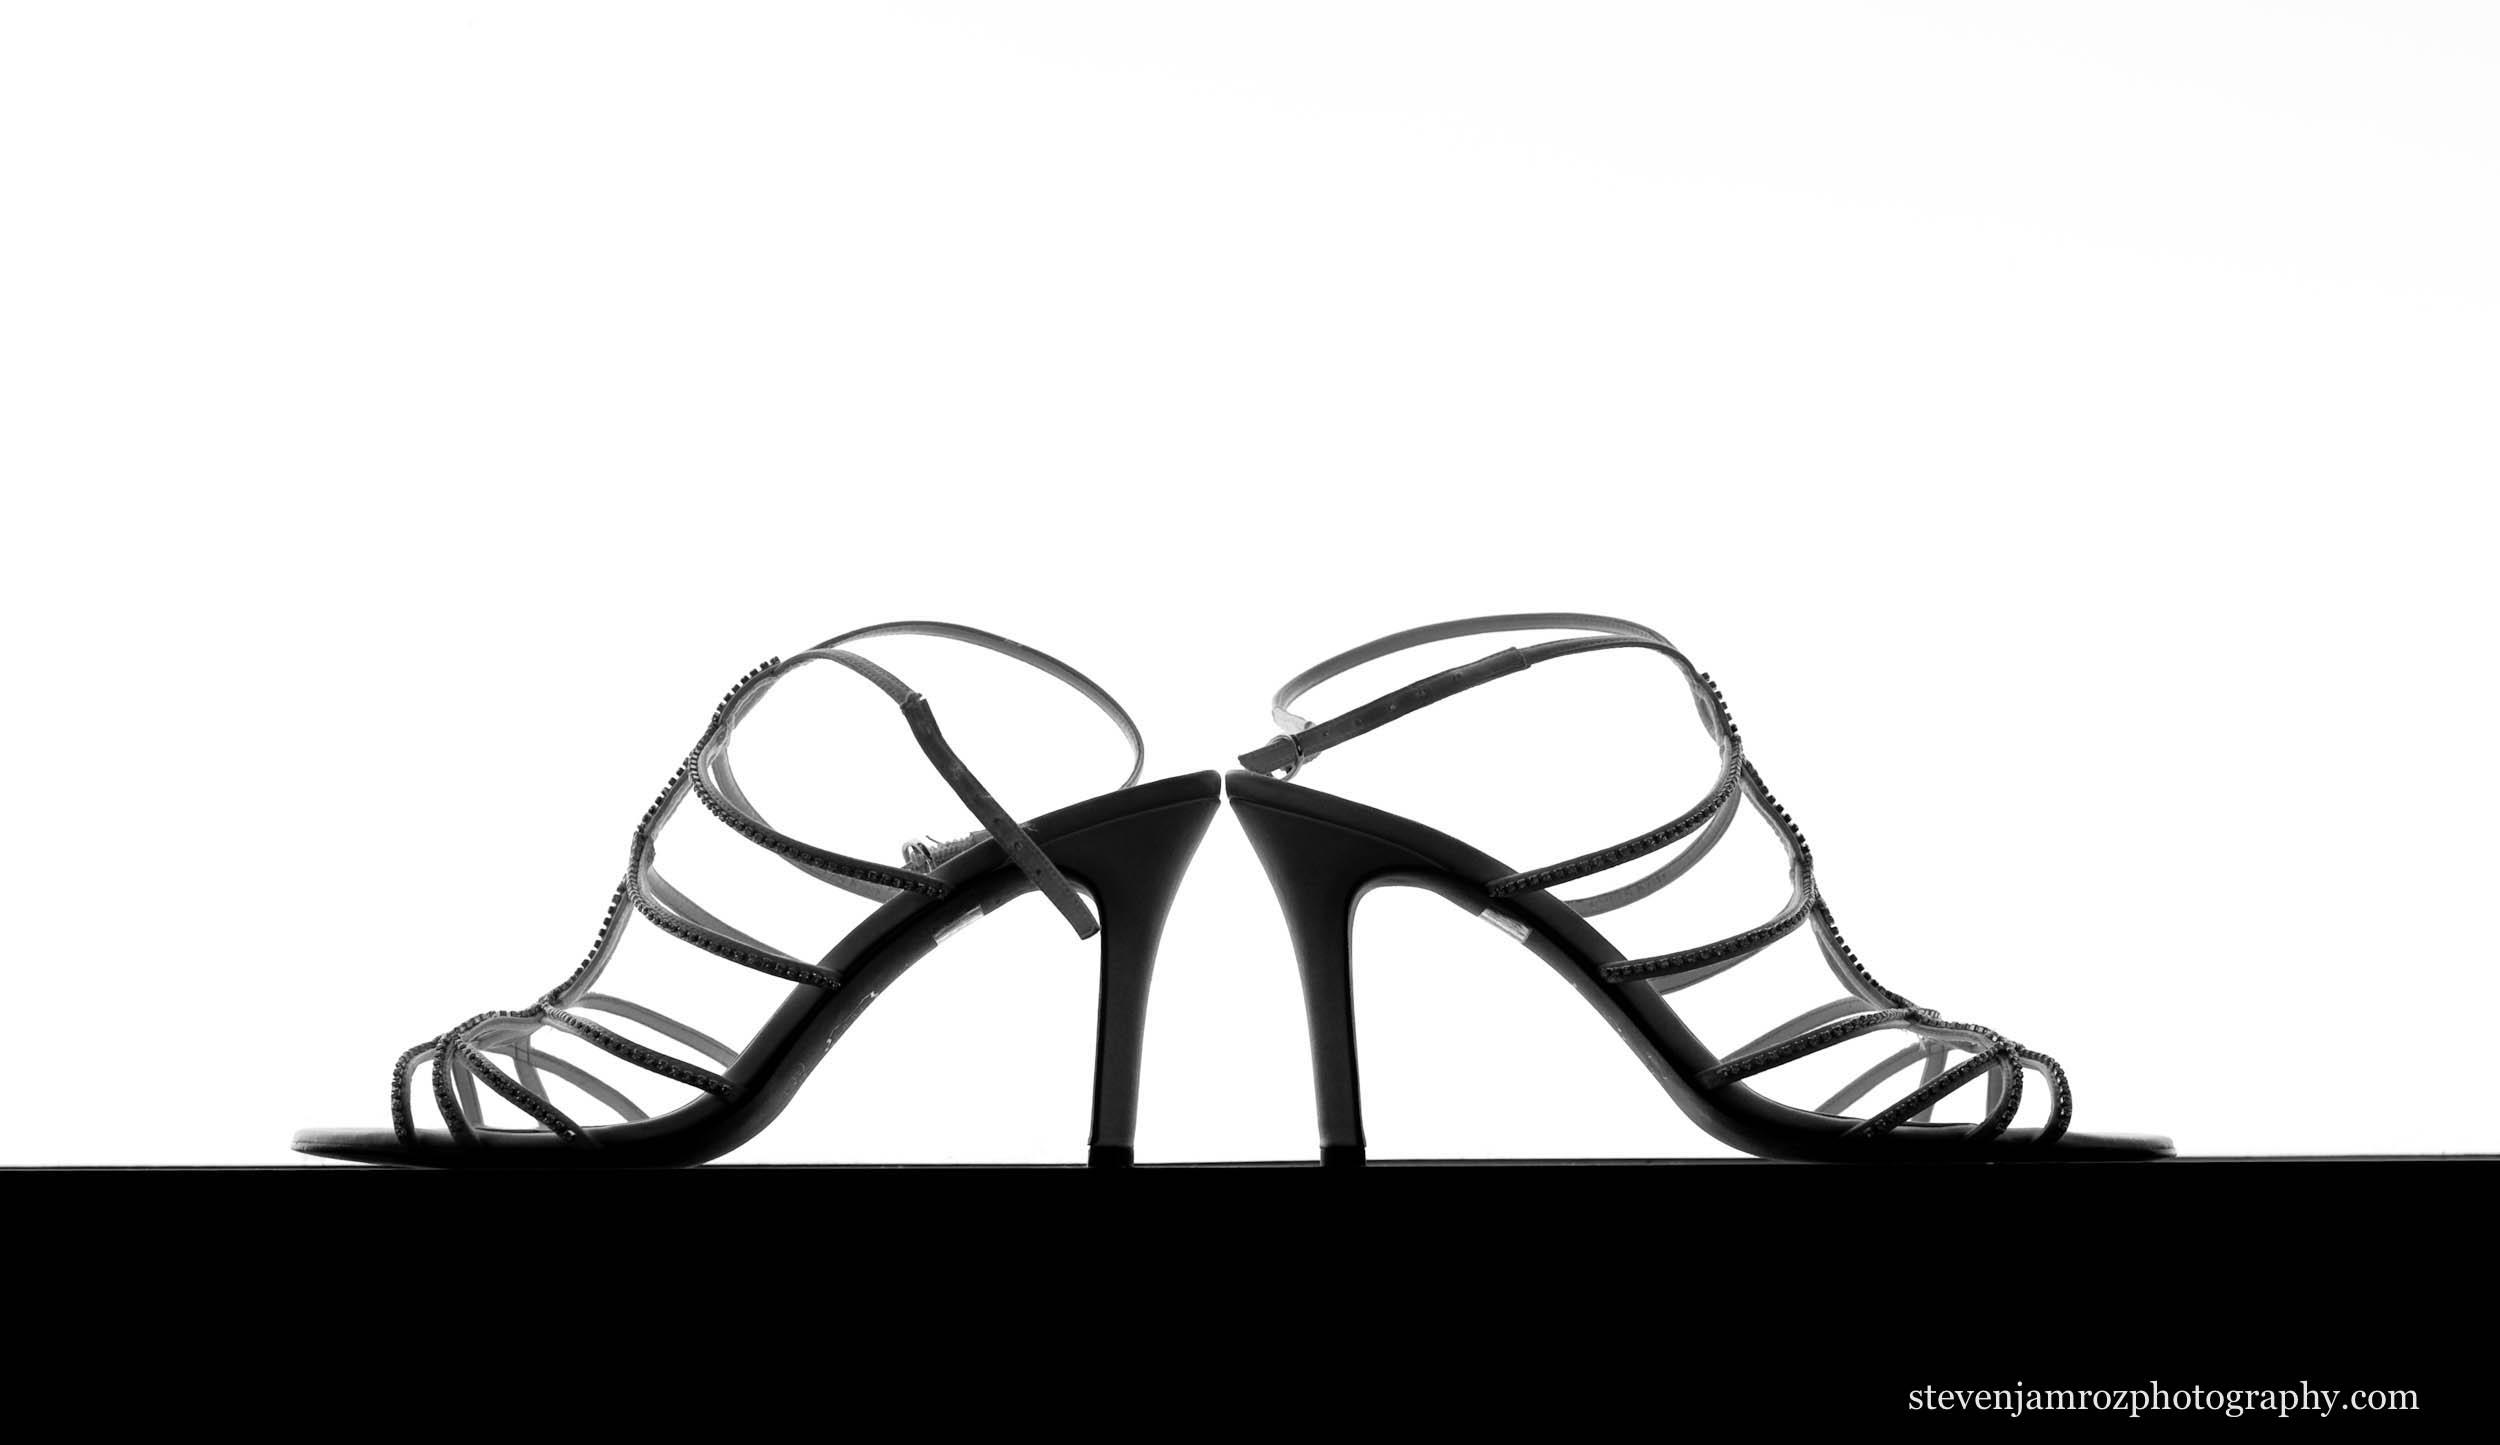 nc-wedding-jimmy-choo-shoes-durham-steven-jamroz-photography-0589.jpg